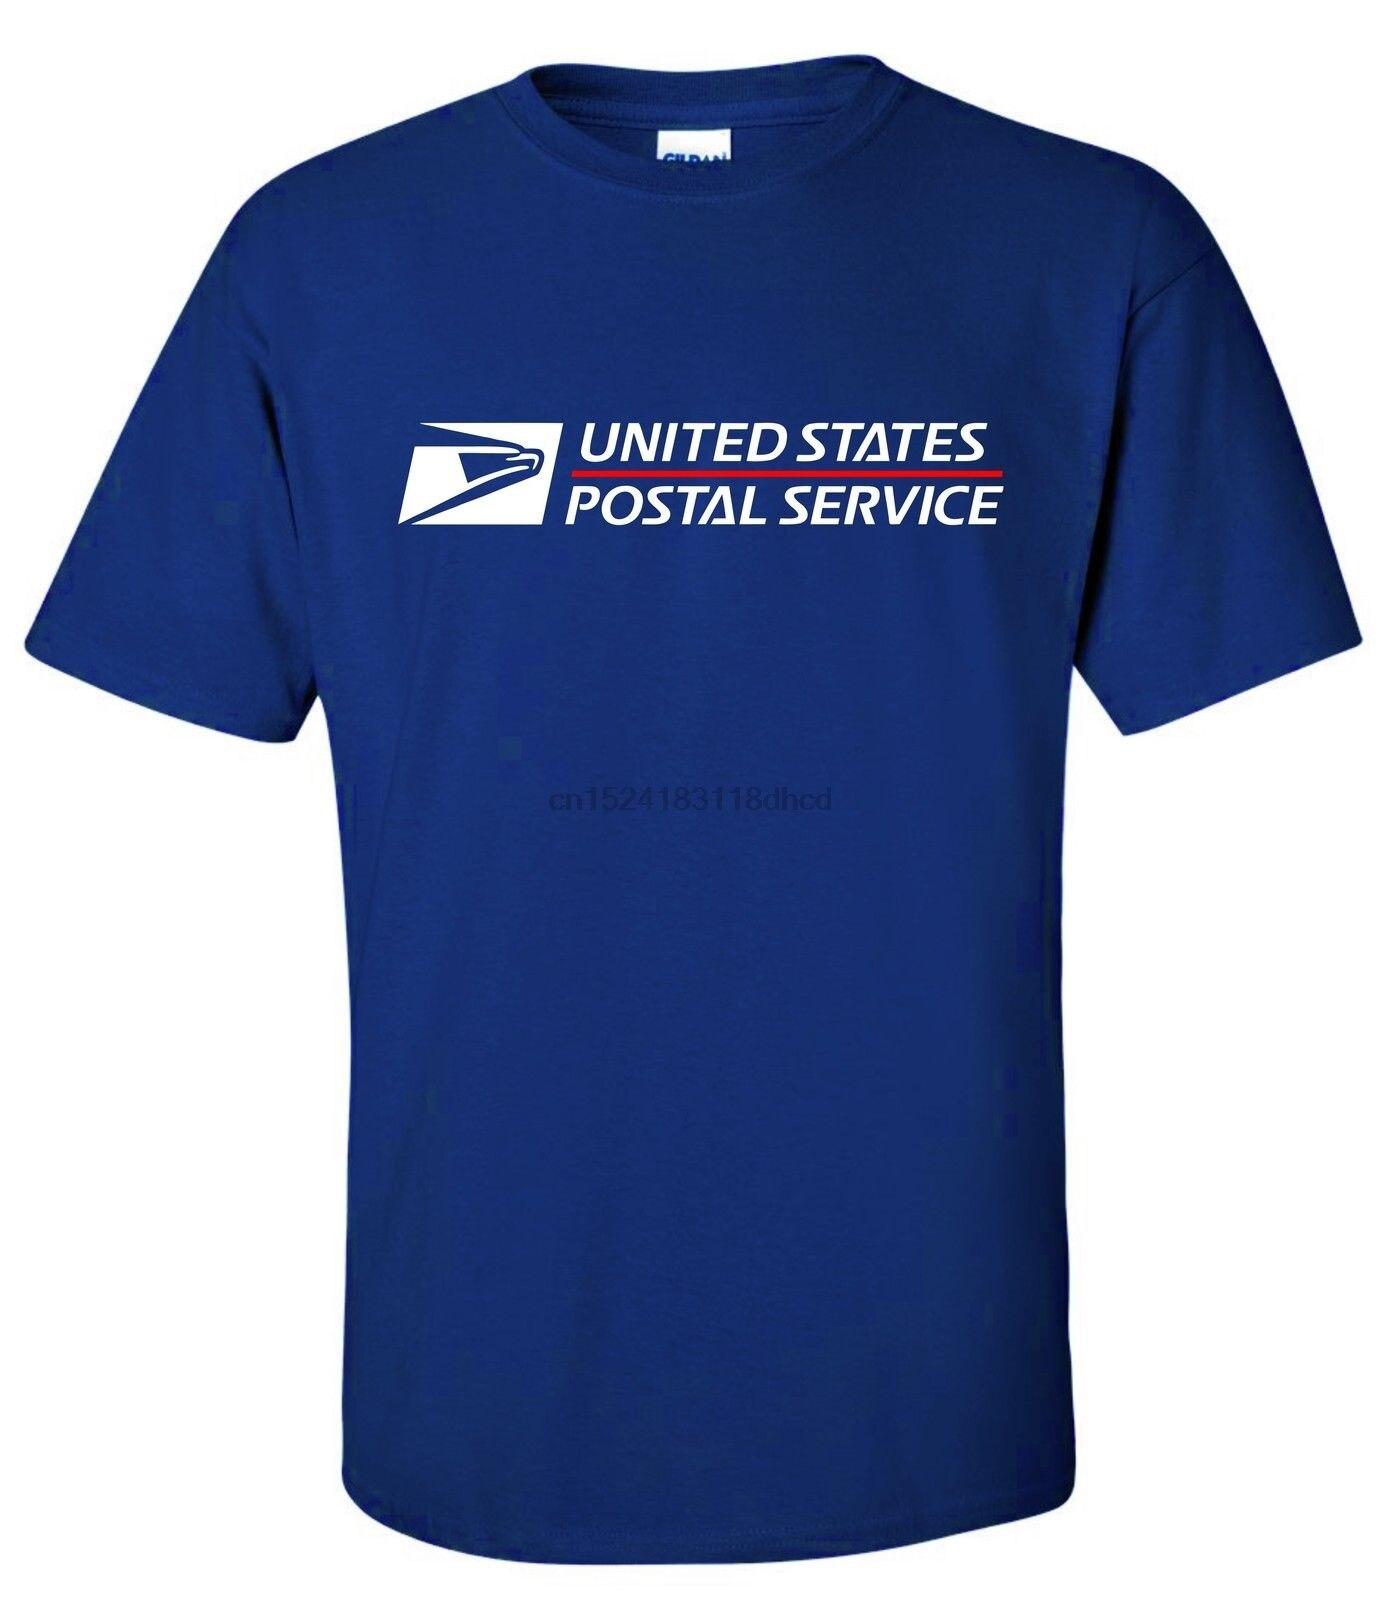 USPS POSTAL, camiseta de manga corta, Logo en el pecho, servicio Postal NAVY 2